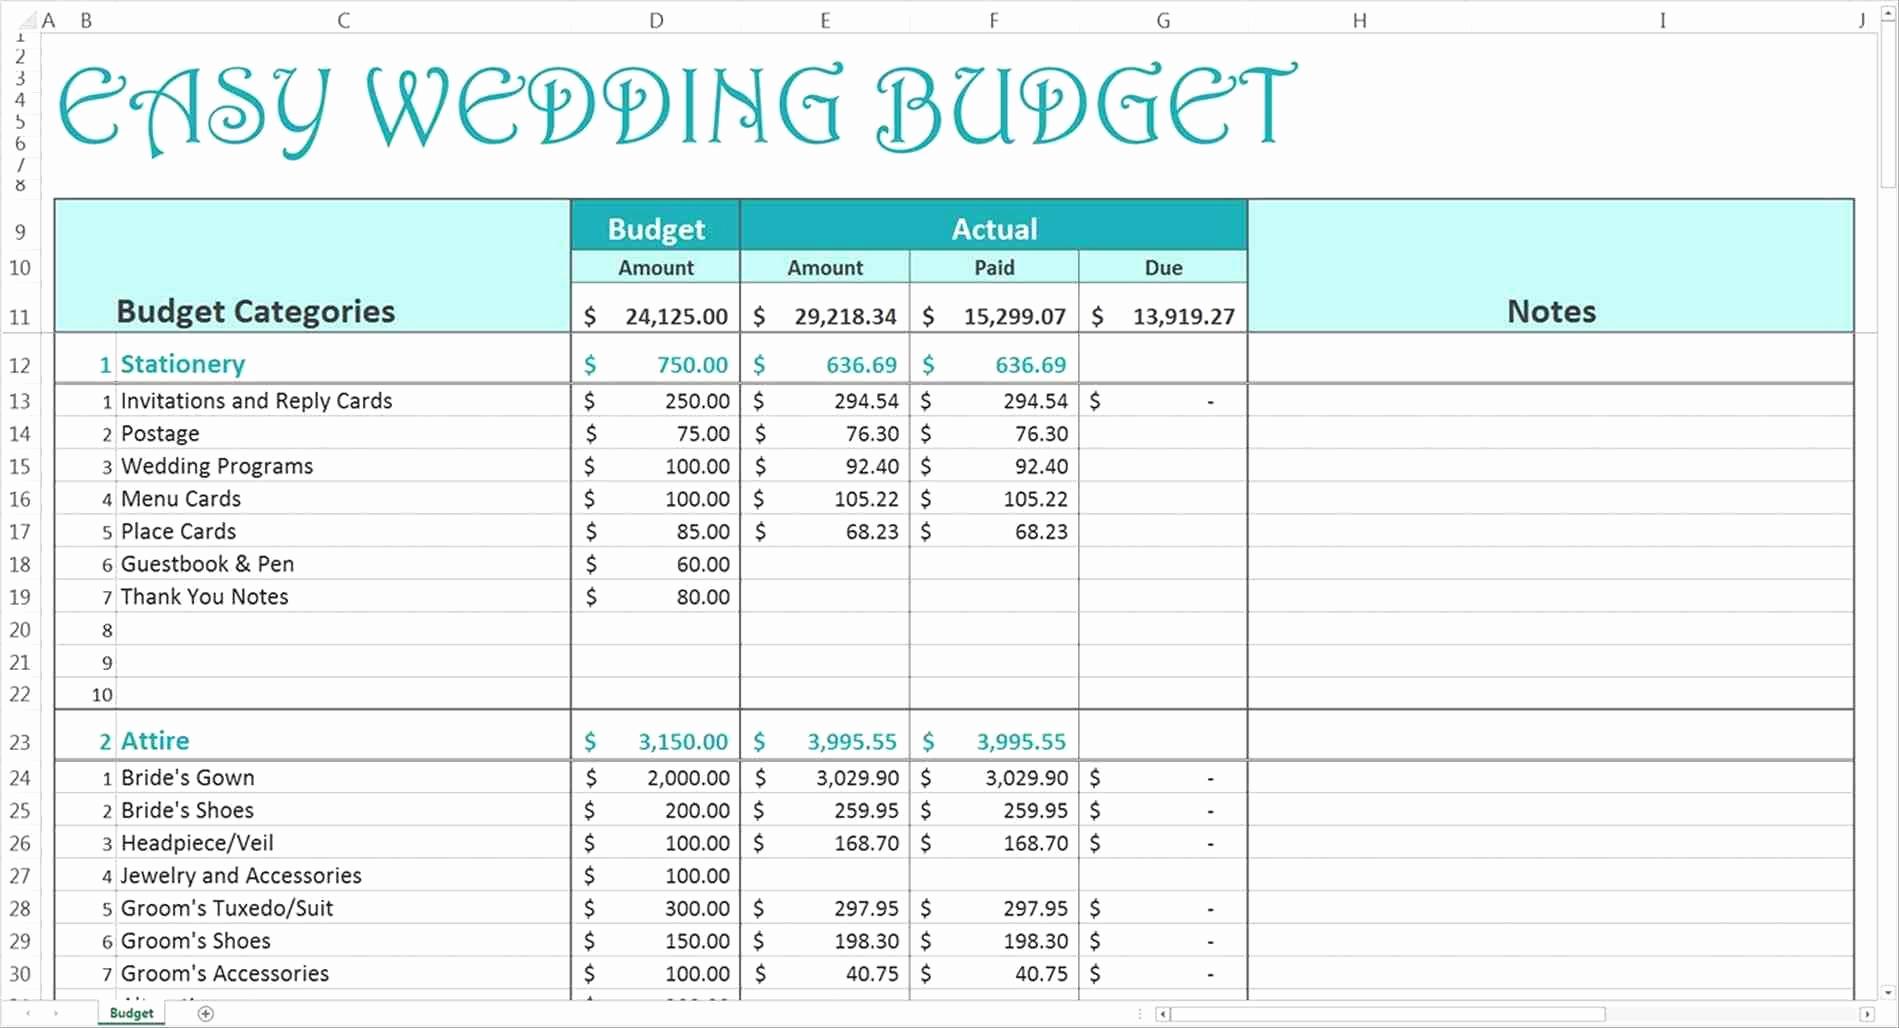 Destination Wedding Budget Spreadsheet Pertaining To Destination Wedding Budget Spreadsheet With Excel Plus Together As